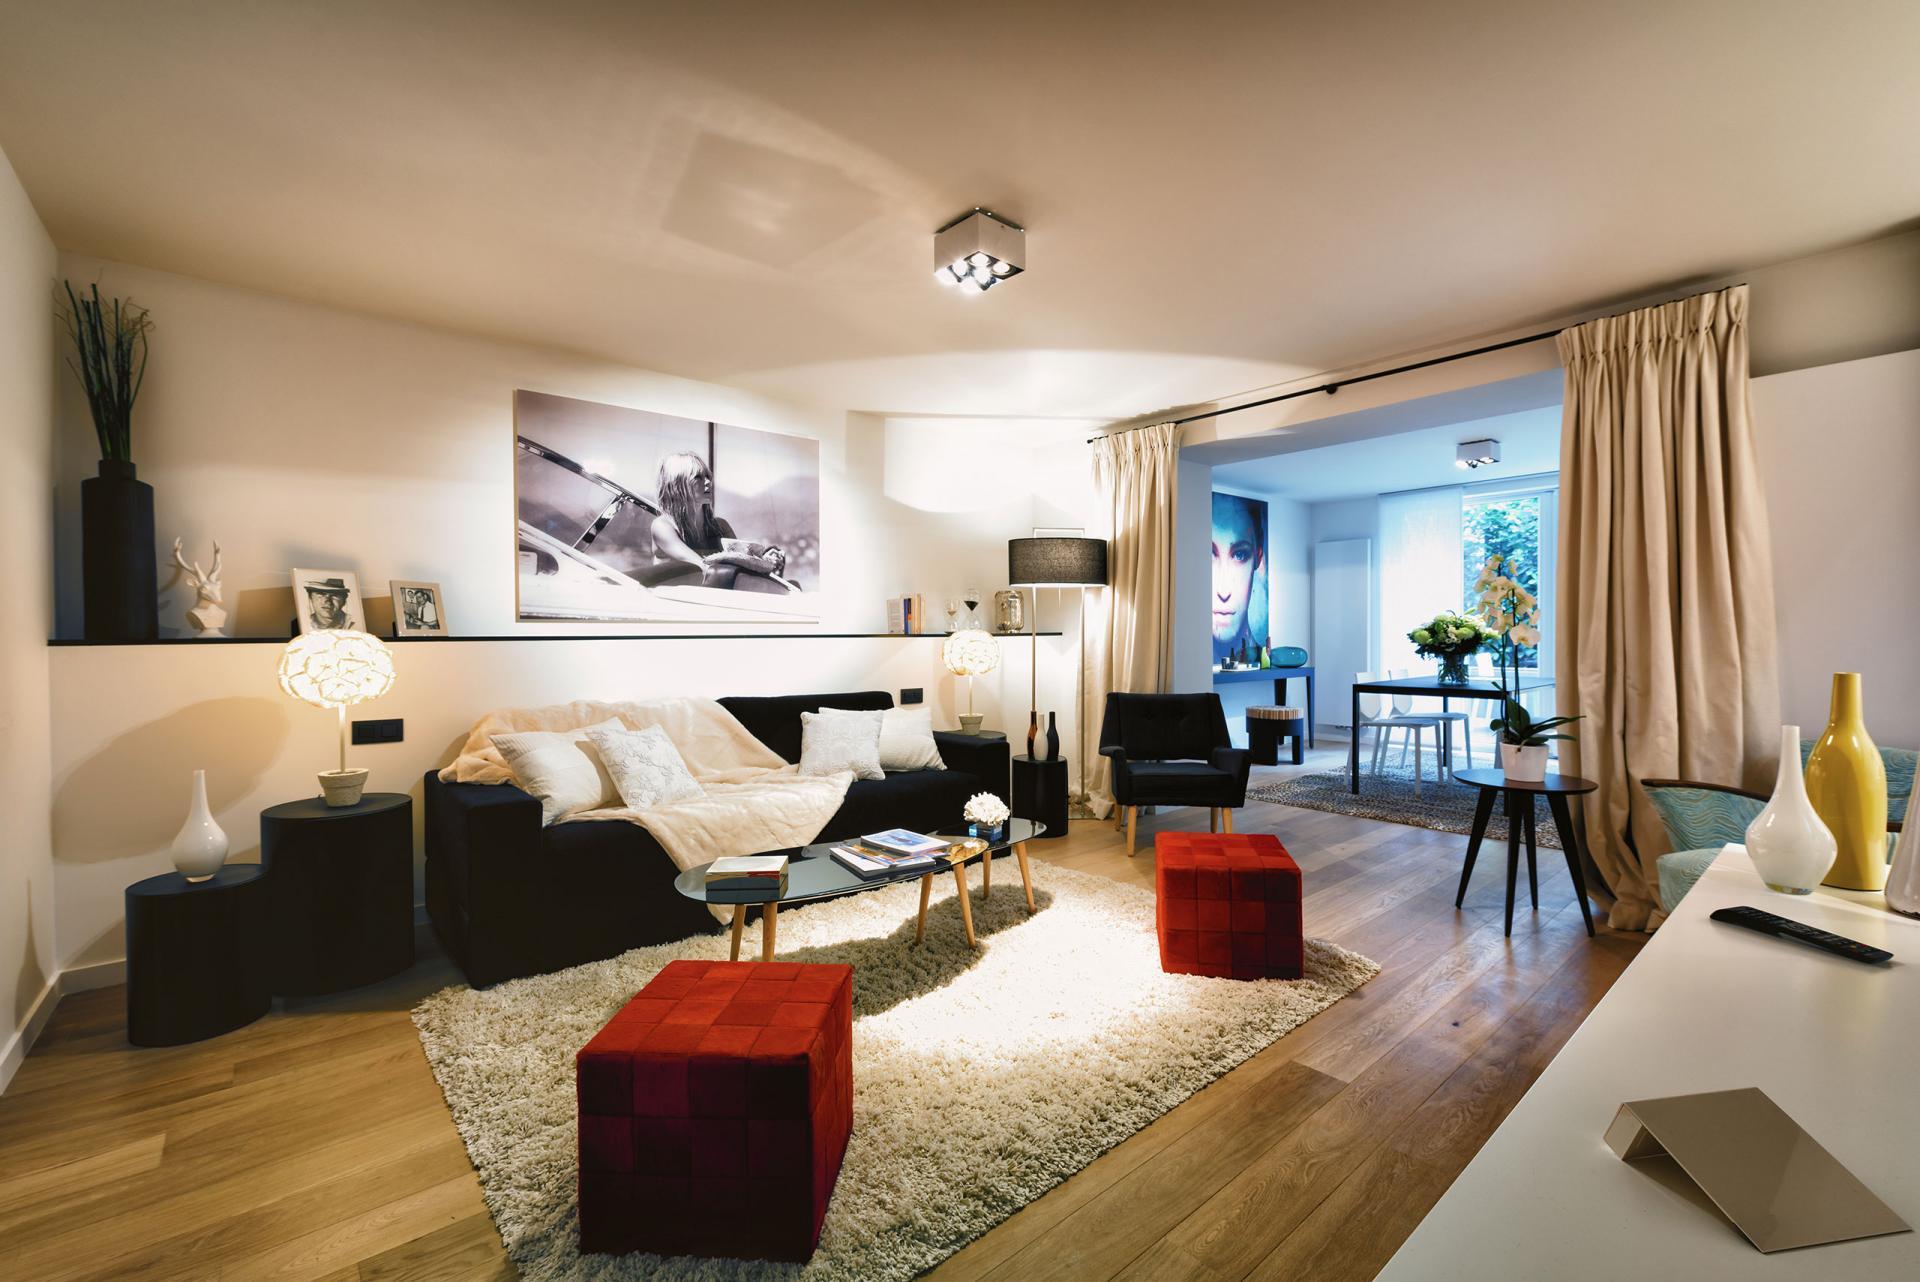 Living/Sleeping area at Amazone Charles Apartments - Citybase Apartments